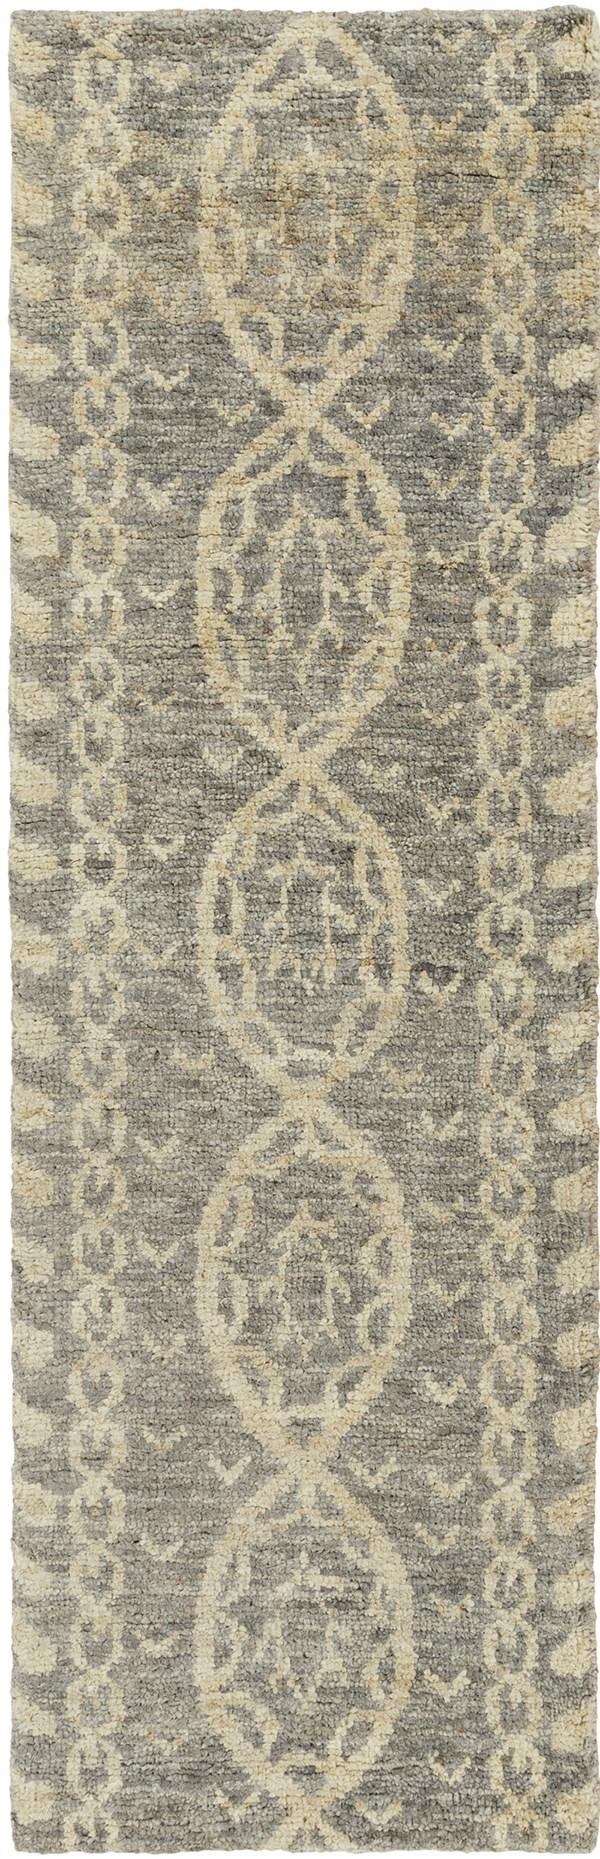 Medium Gray, Dark Brown, Khaki Transitional Area Rug